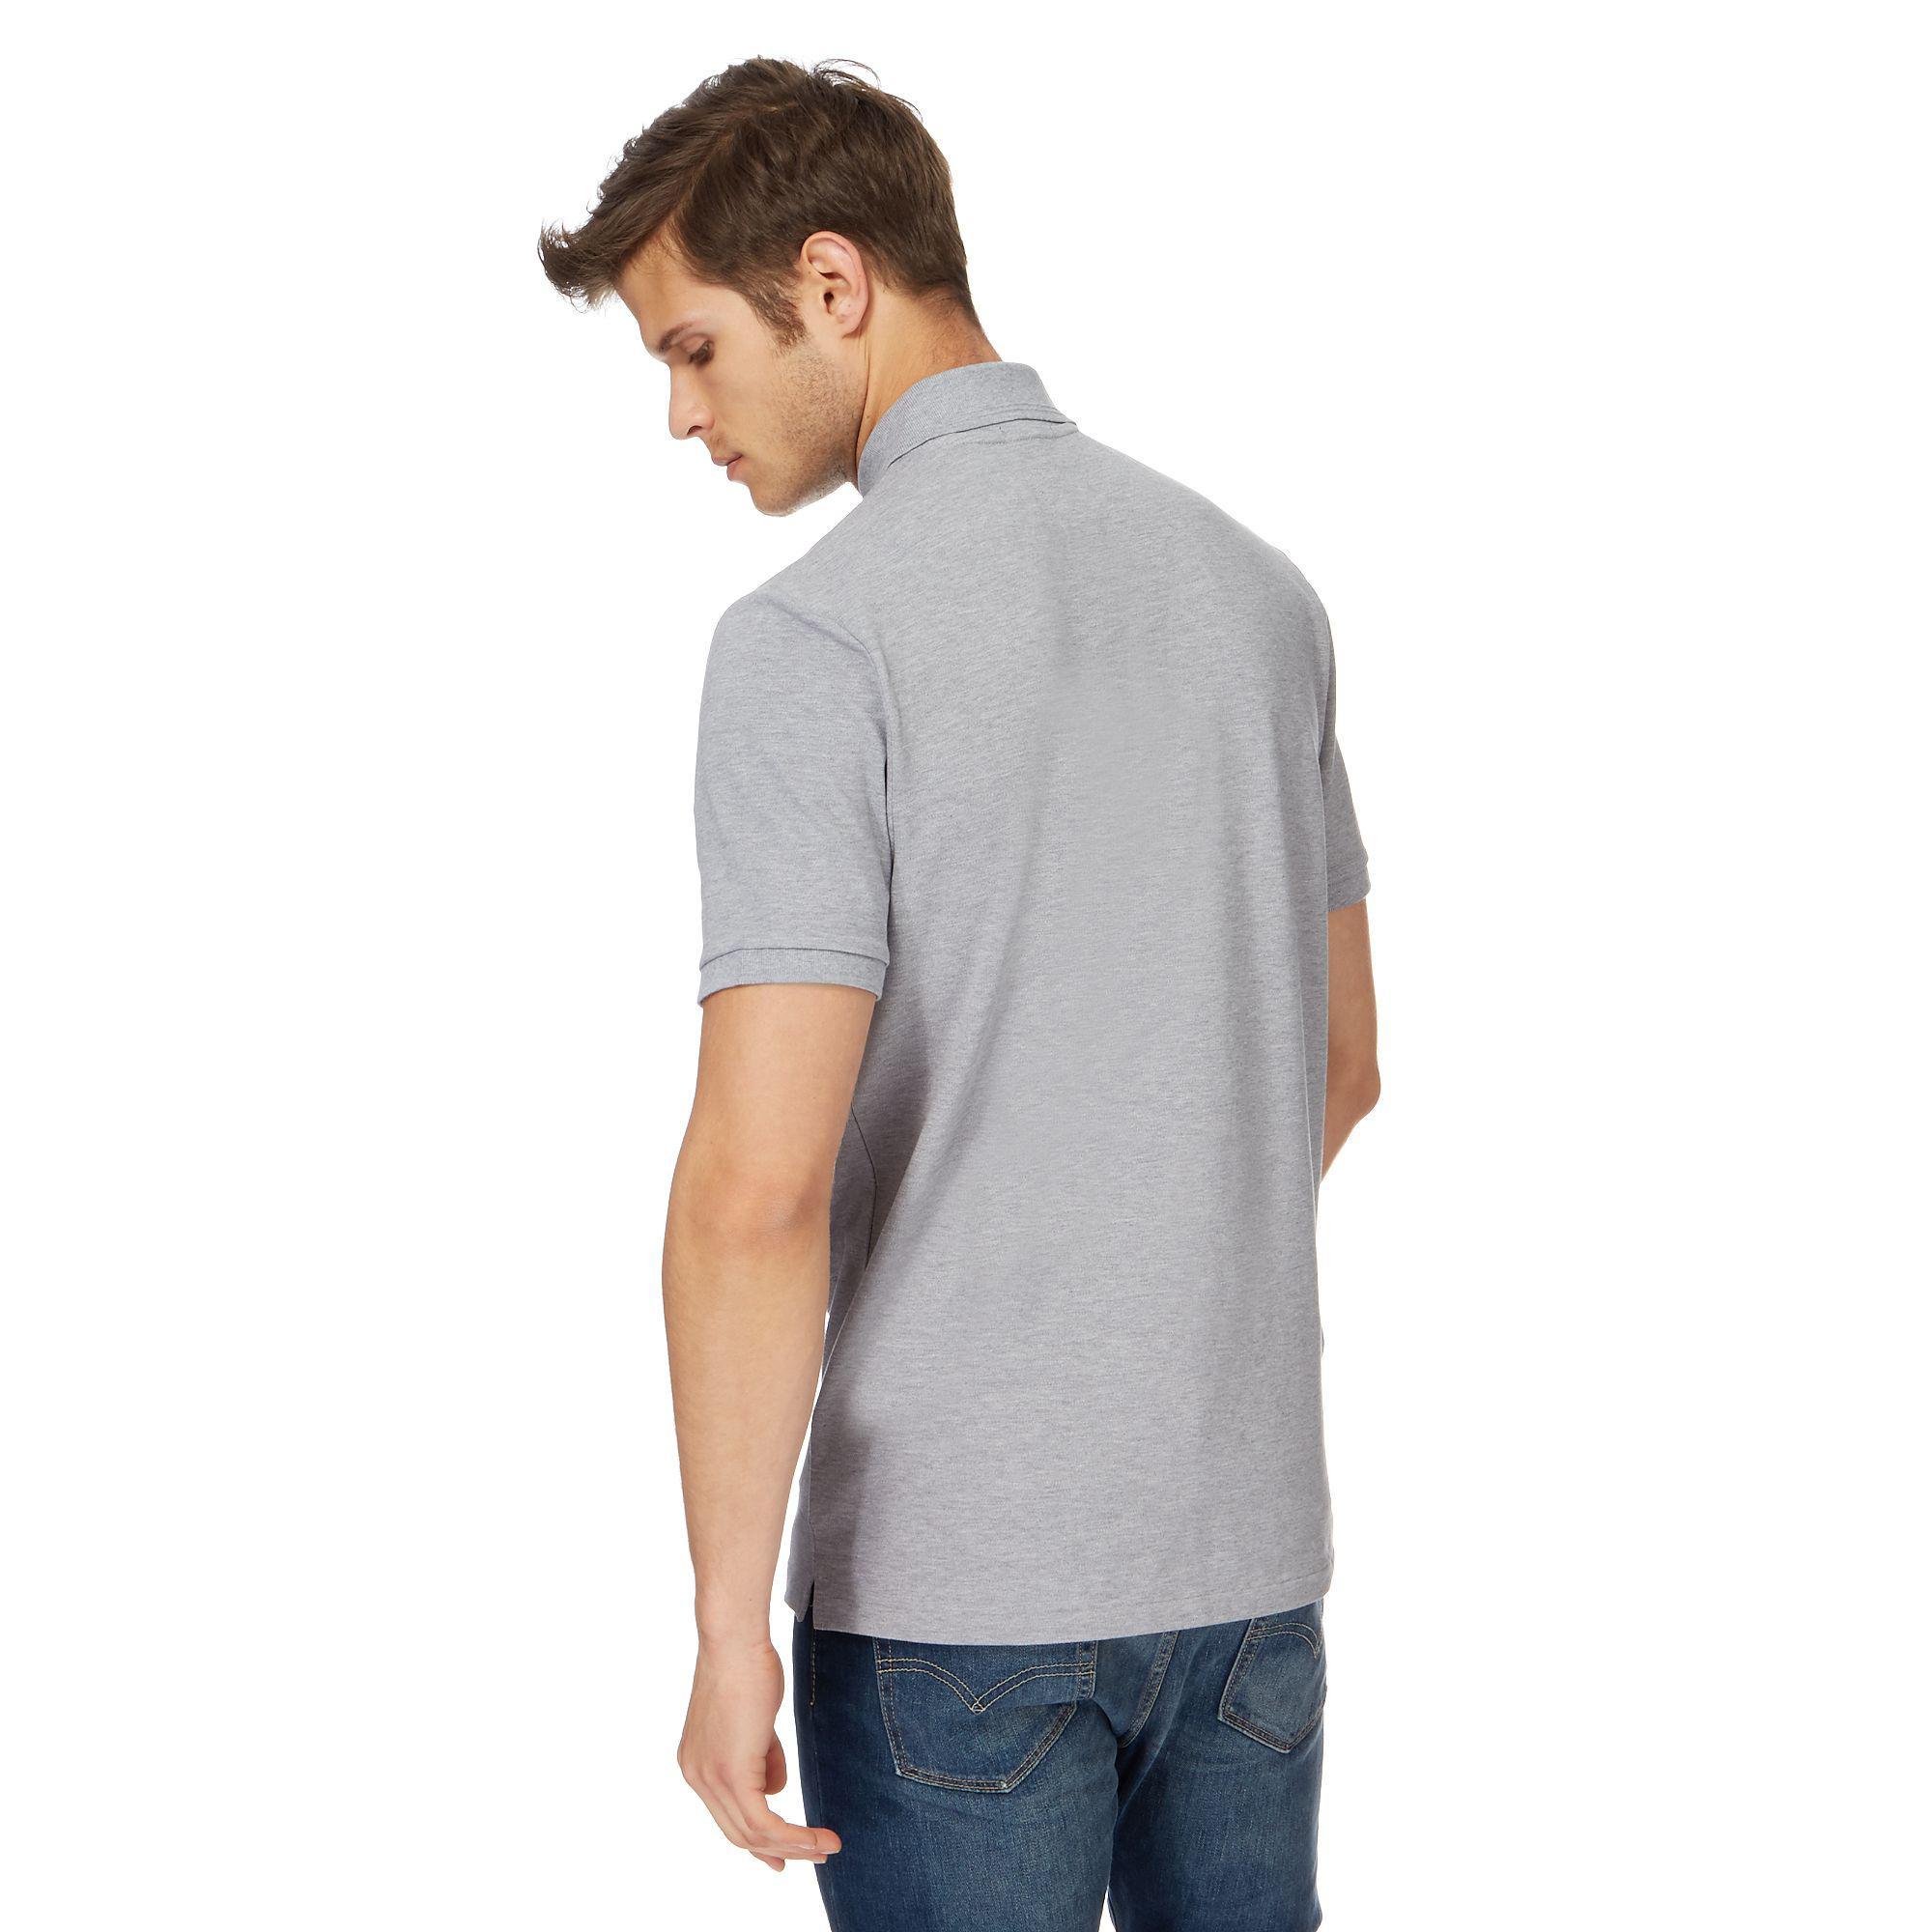 678de809206 G-Star RAW - Gray Grey Embroidered Logo Slim Fit Polo Shirt for Men -. View  fullscreen